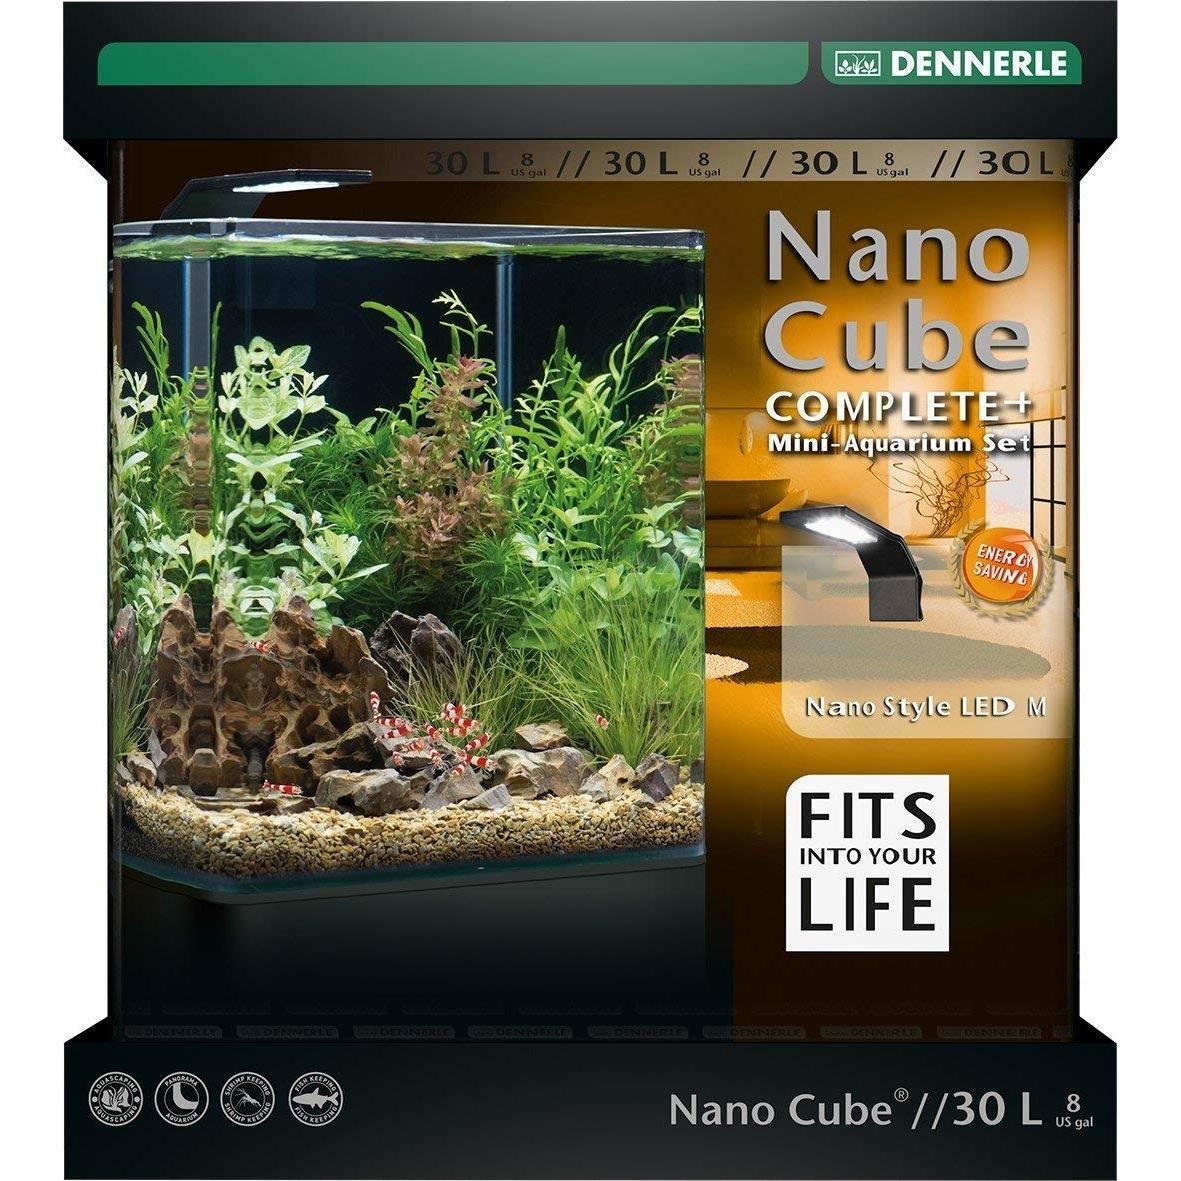 Dennerle NanoCube Complete+ Style LED Bild 9